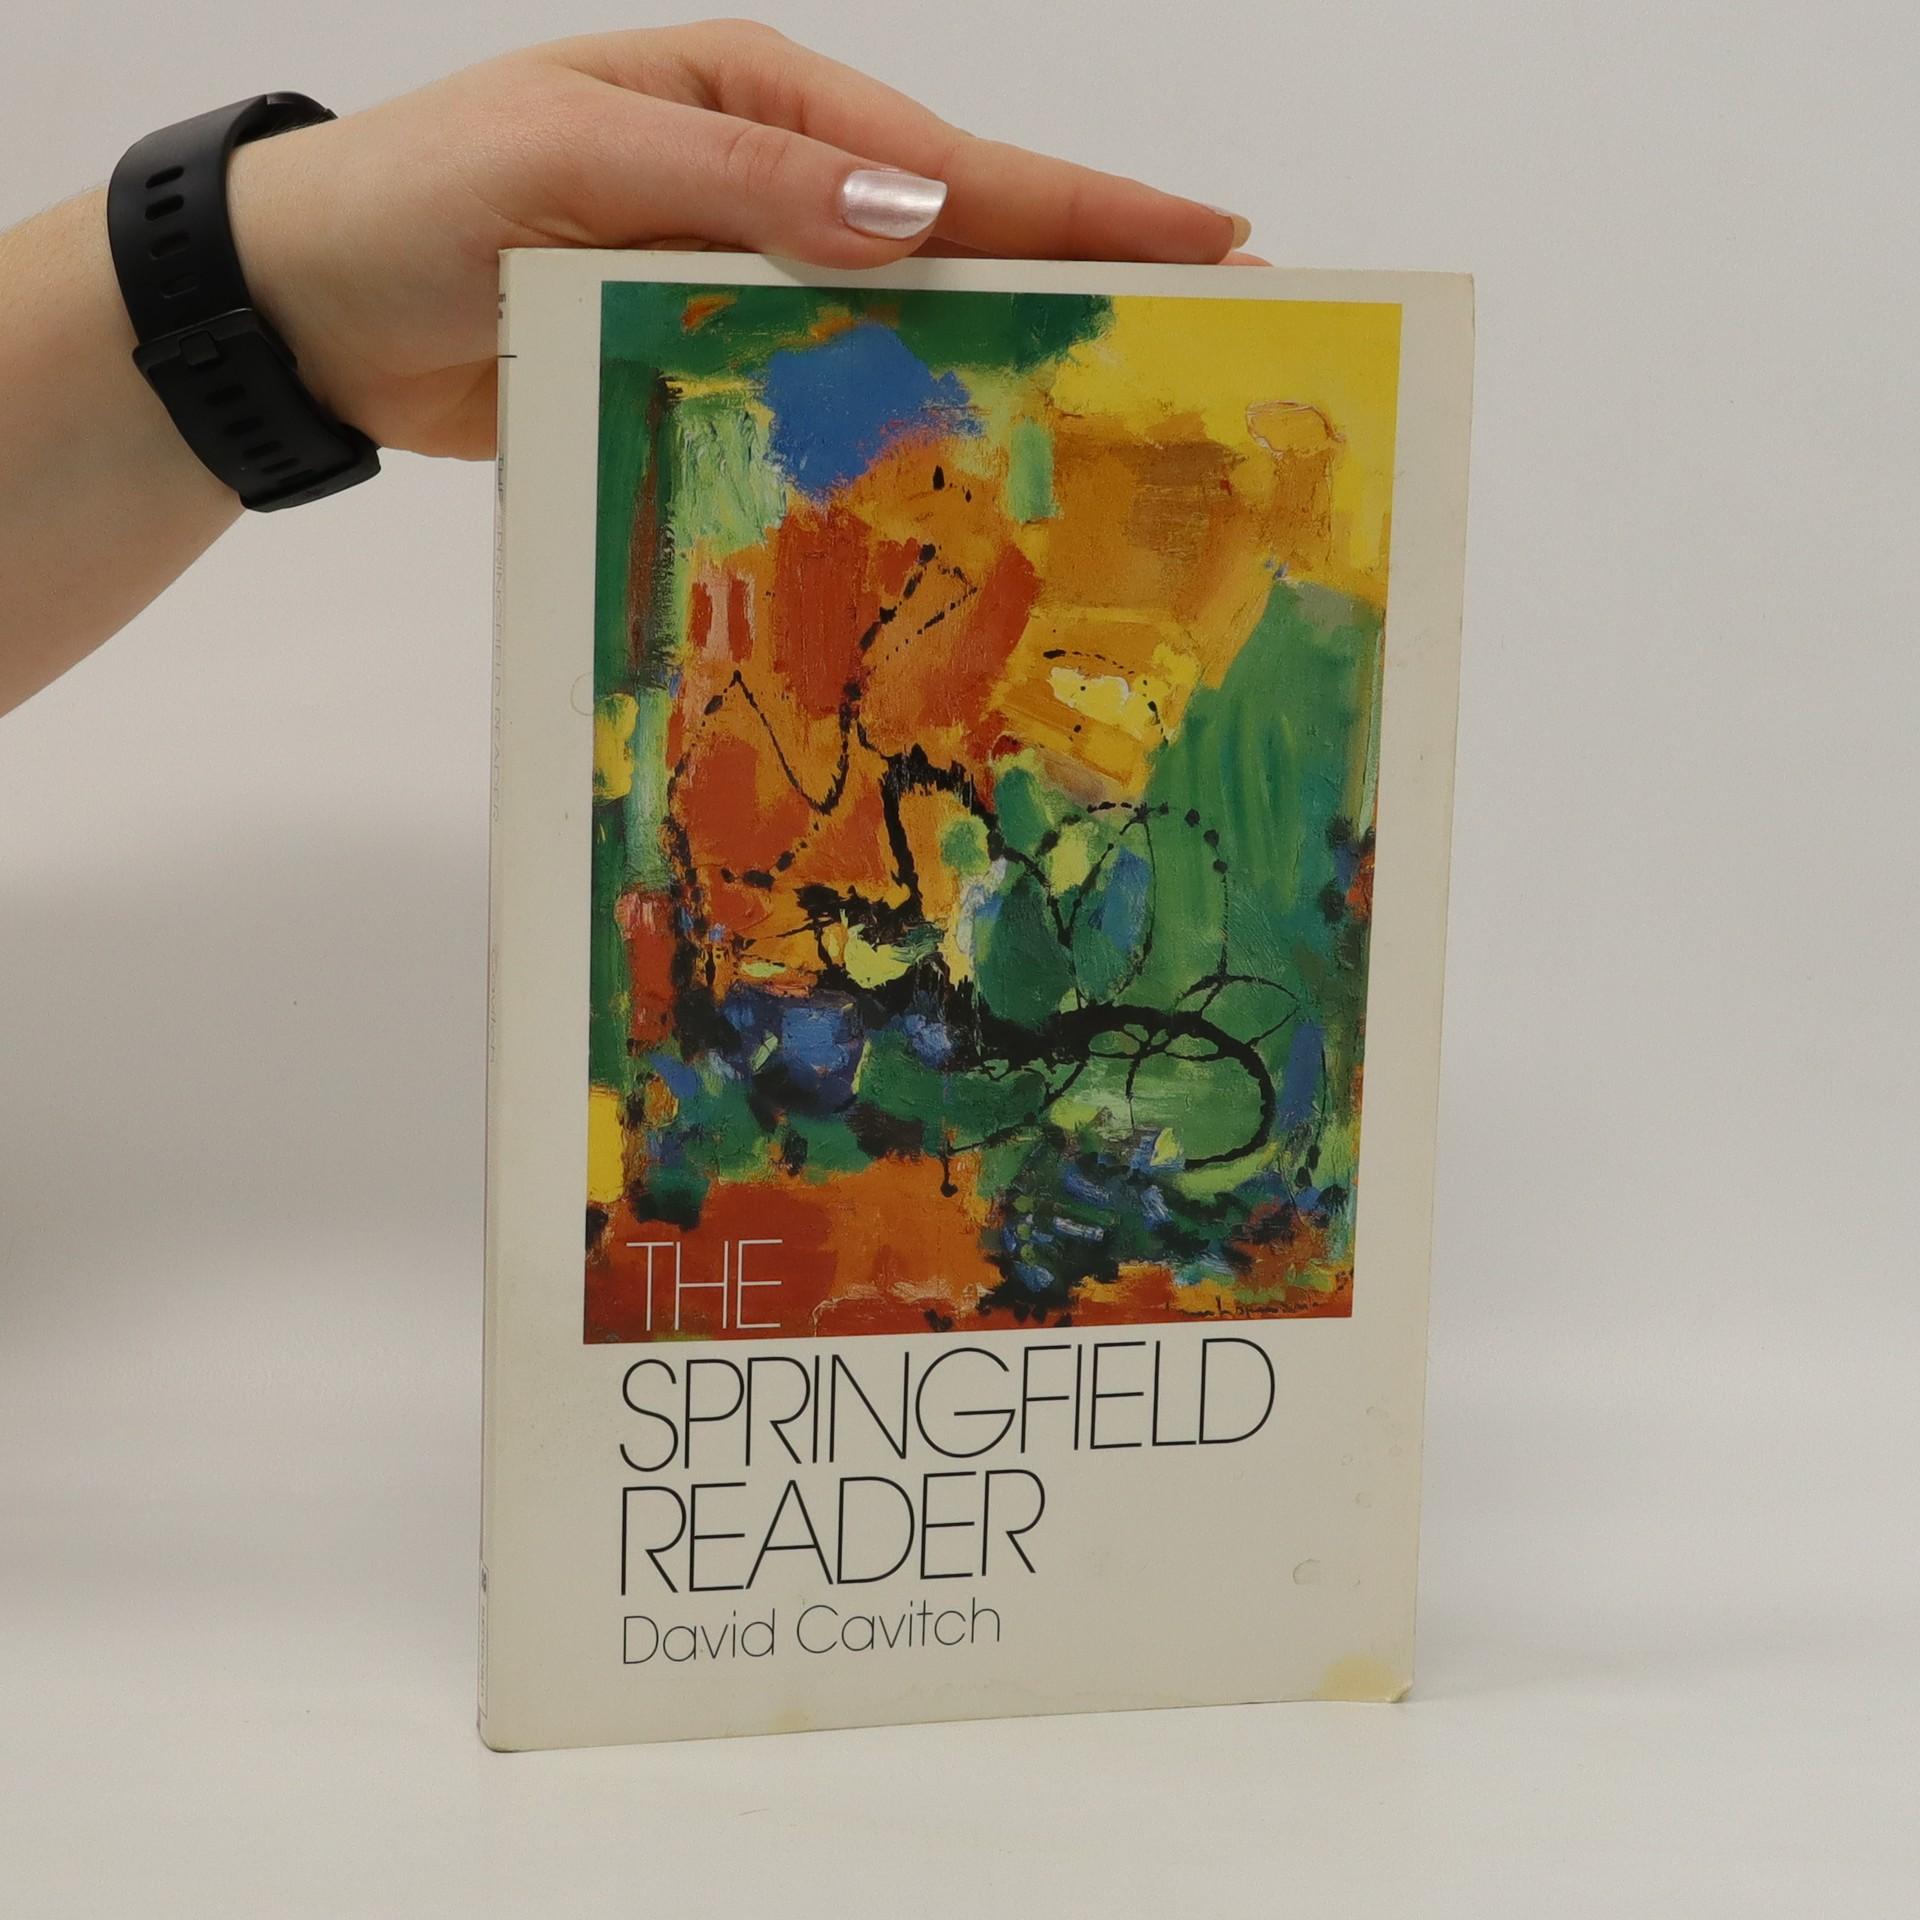 antikvární kniha The Springfield Reader, neuveden